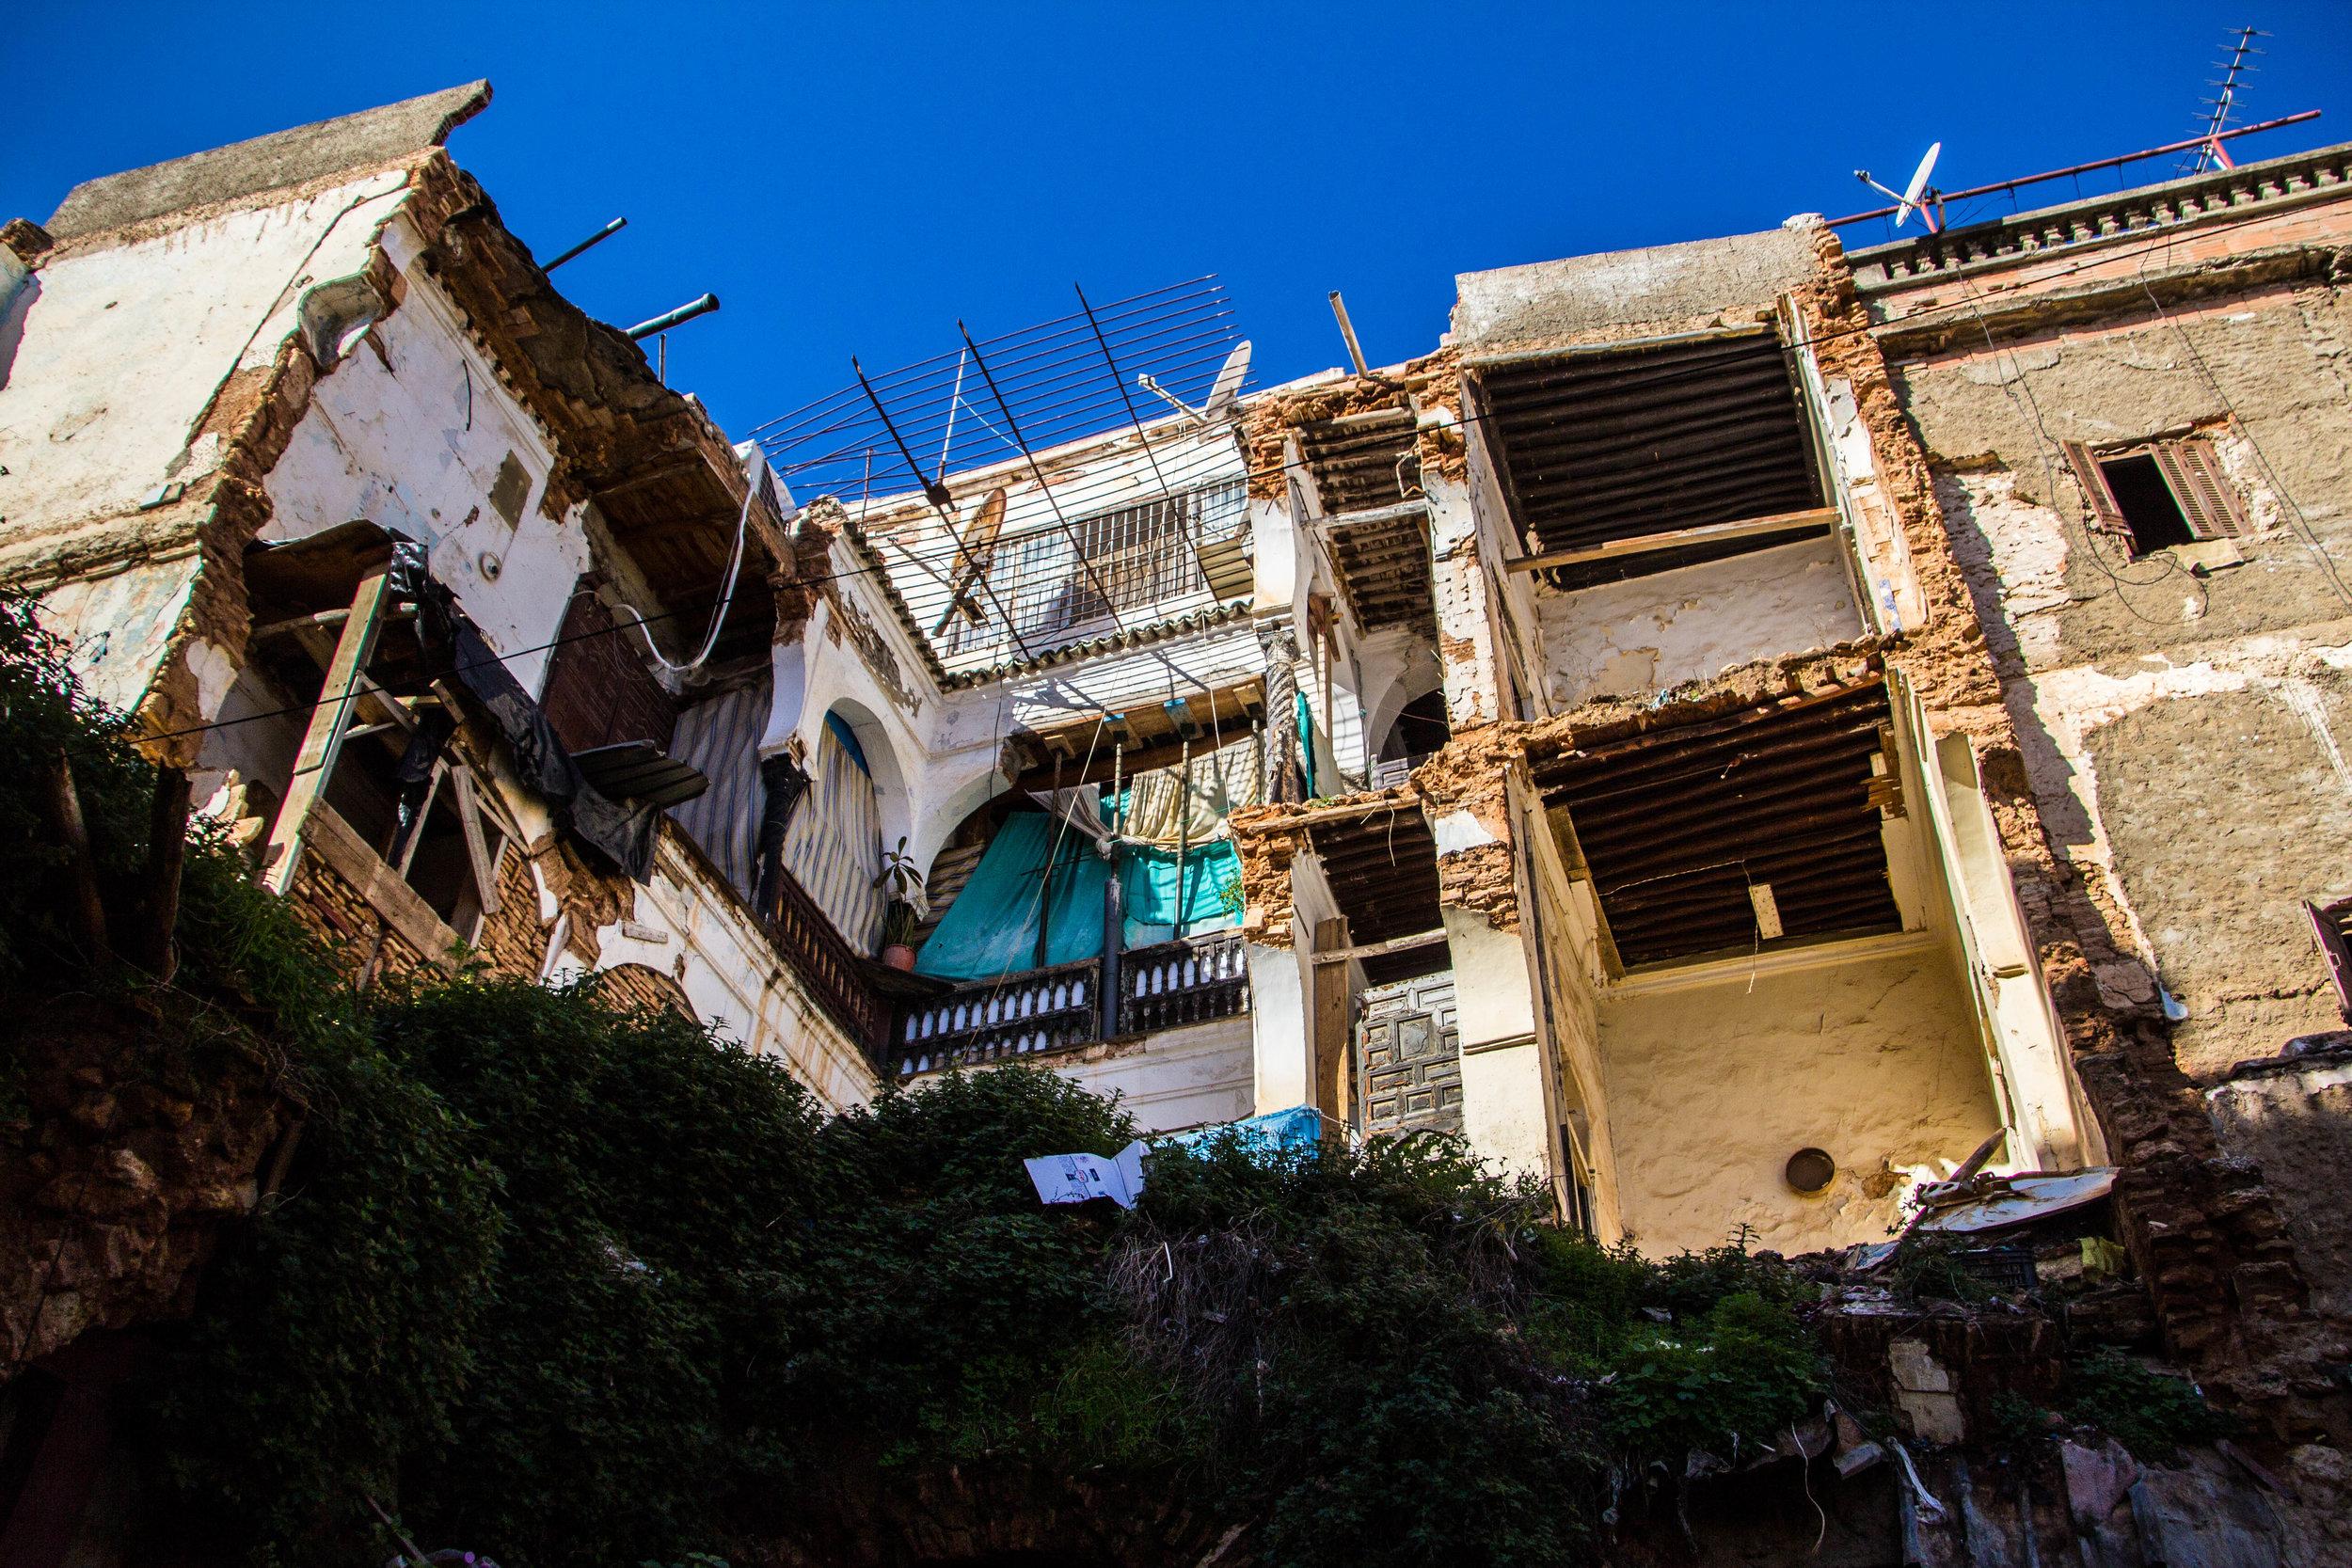 casbah-photography-algiers-algeria-alger-25.jpg